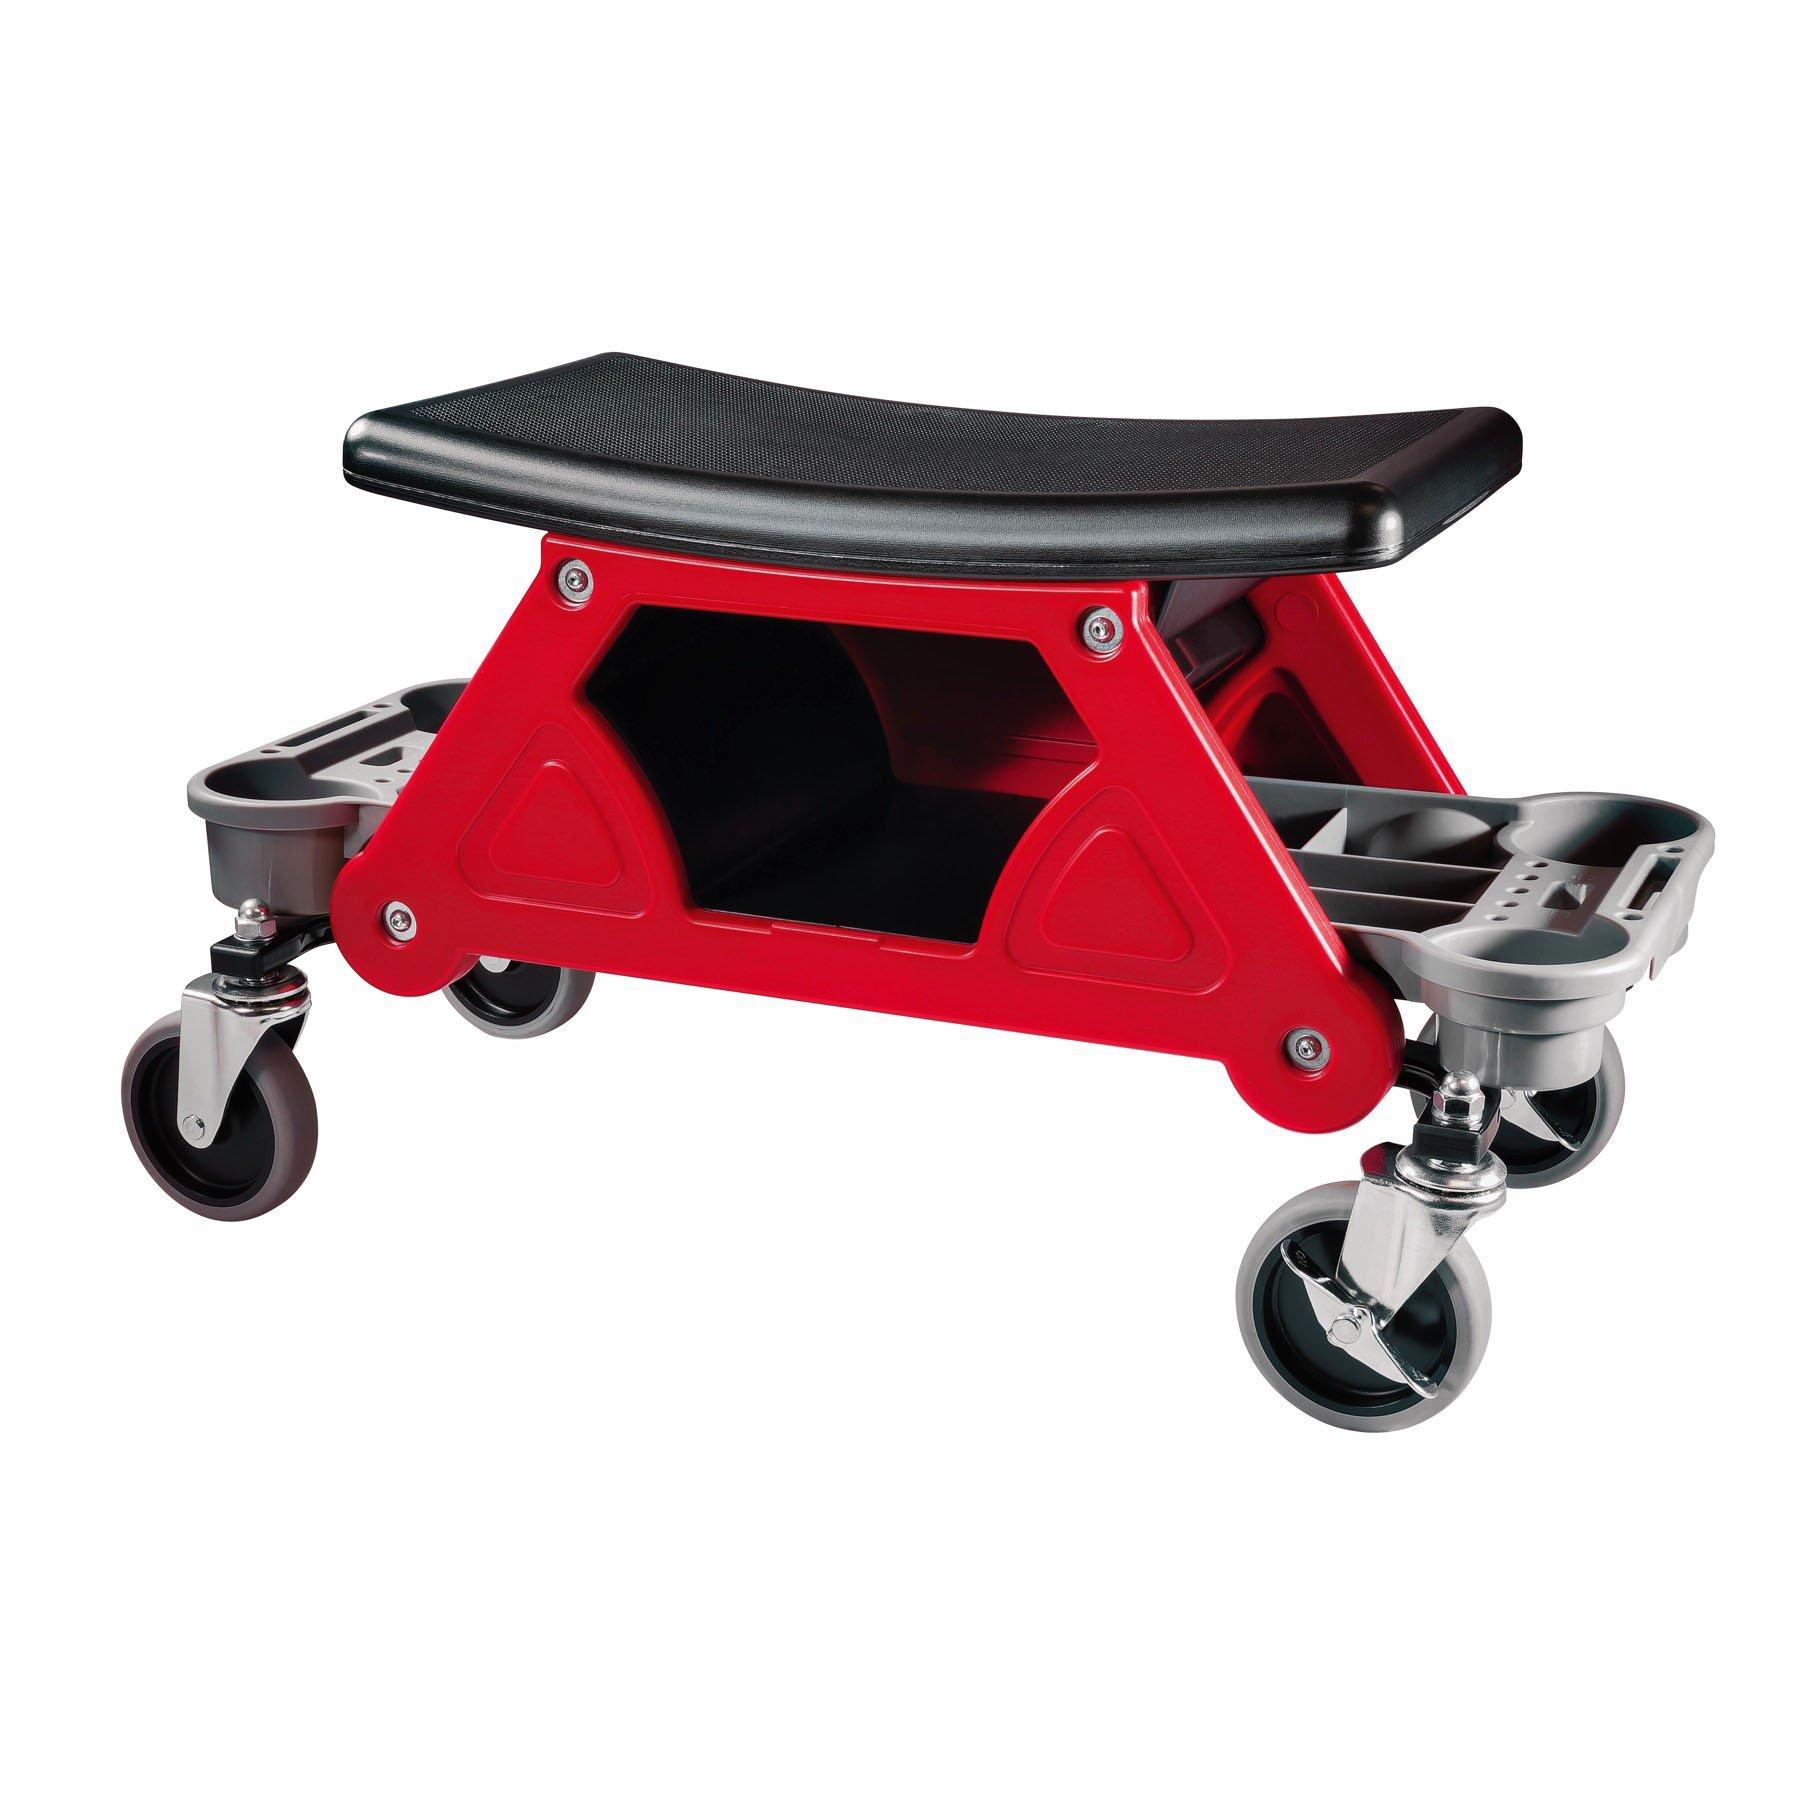 Powerbuilt Heavy Duty Rolling Mechanics Seat Brake Stool 300lb Capacity - 240036 (Stool) by Powerbuilt (Image #3)